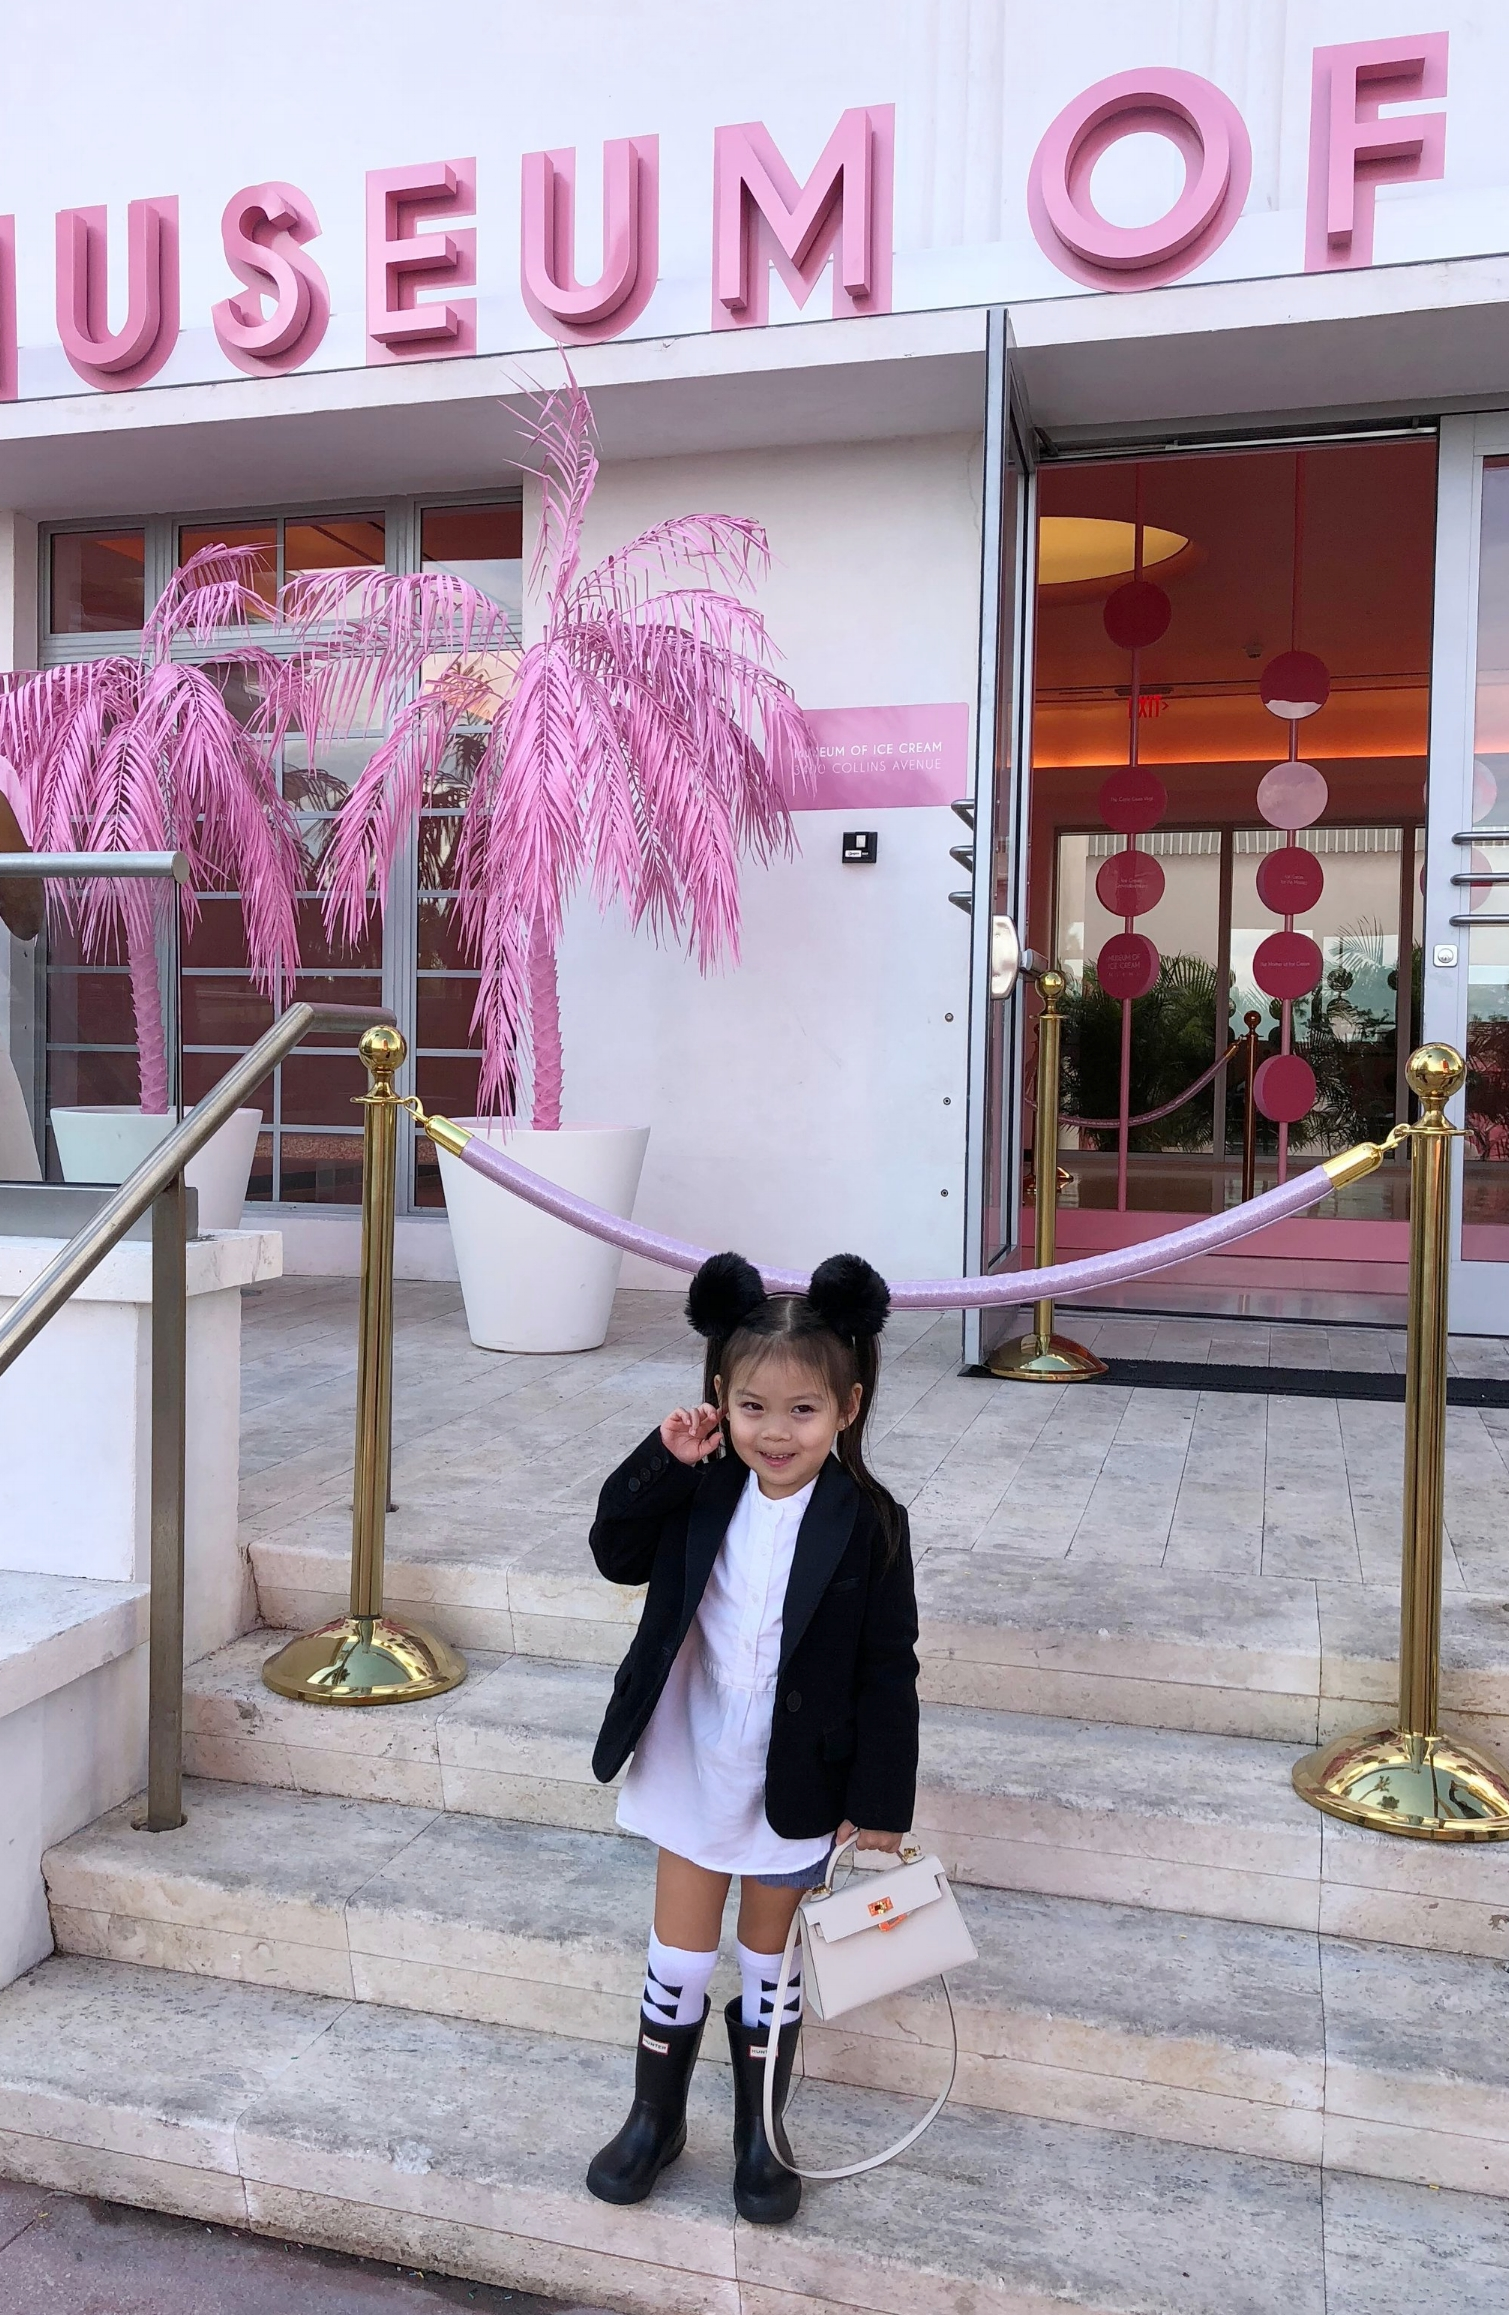 Olivia at the Museum of Ice Cream Miami on meethaha.com